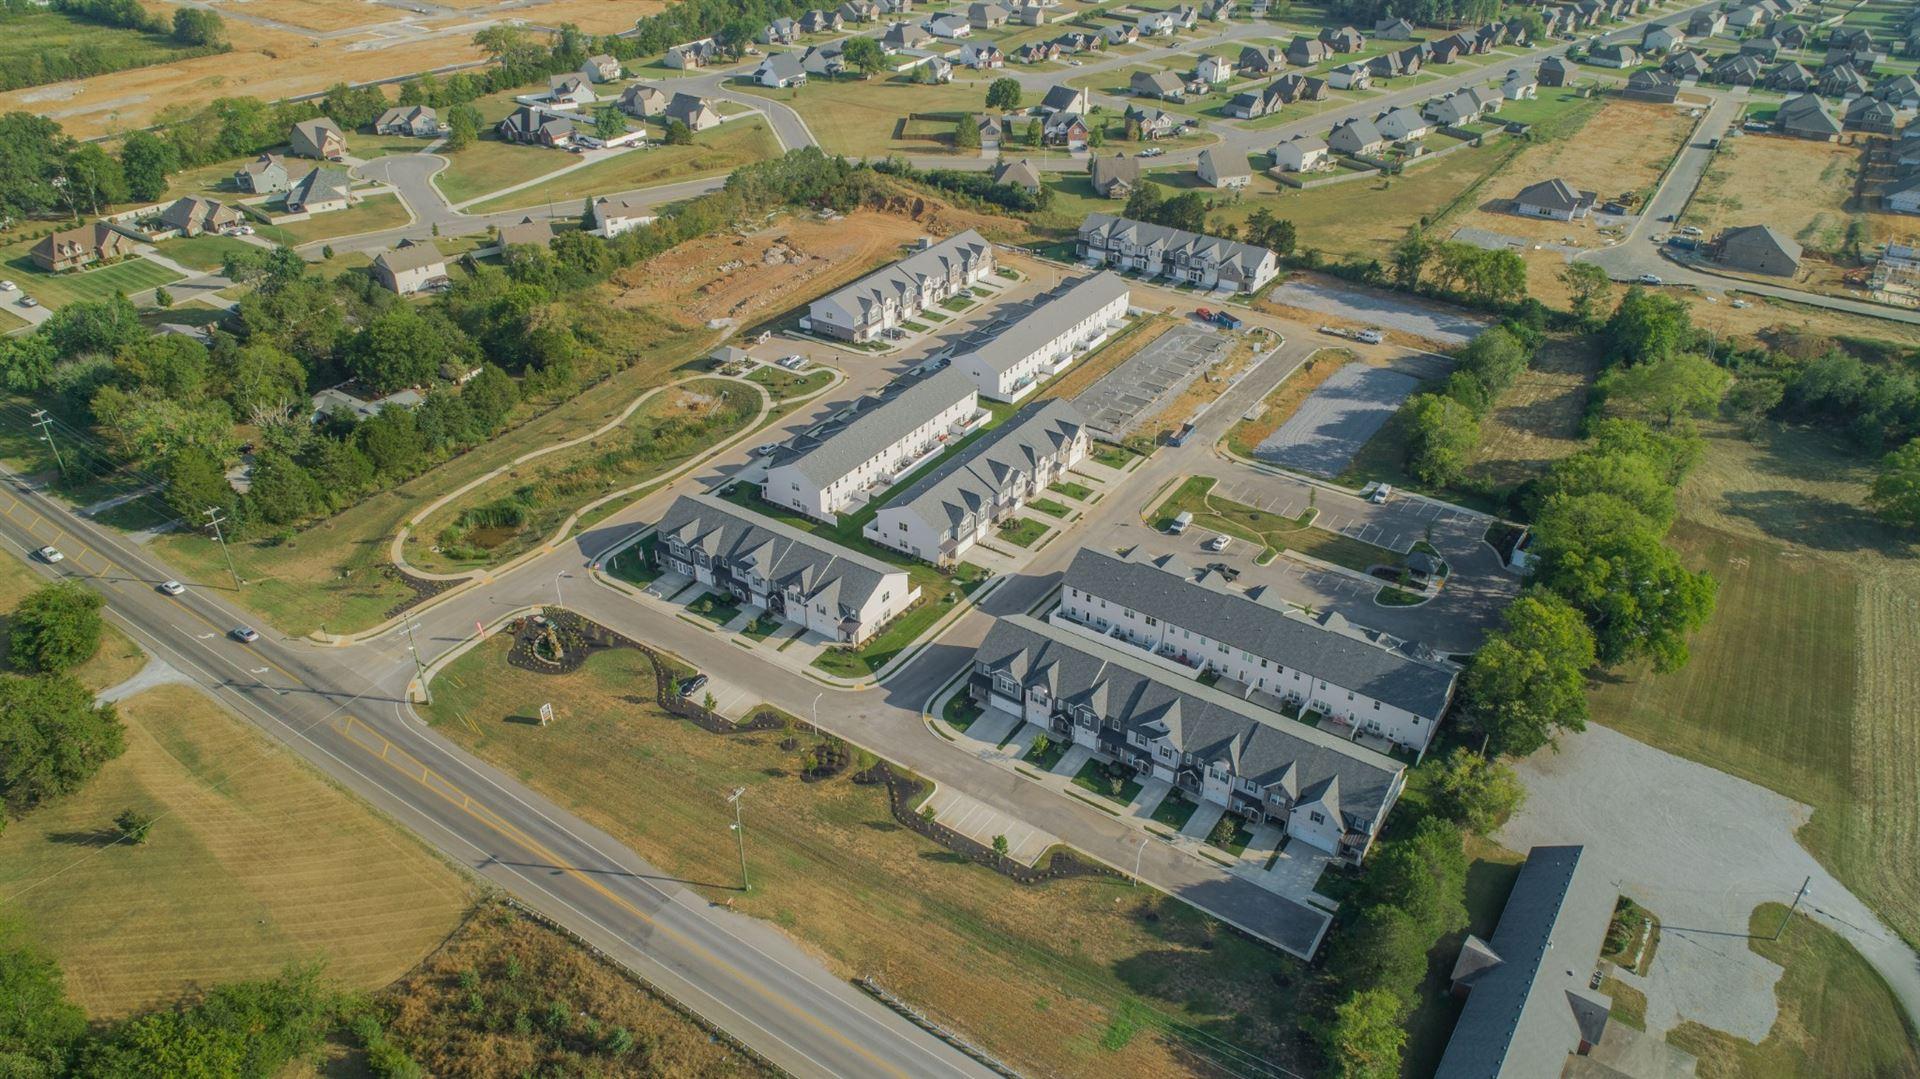 4408 Kesslers Xing, Murfreesboro, TN 37129 - MLS#: 2172607